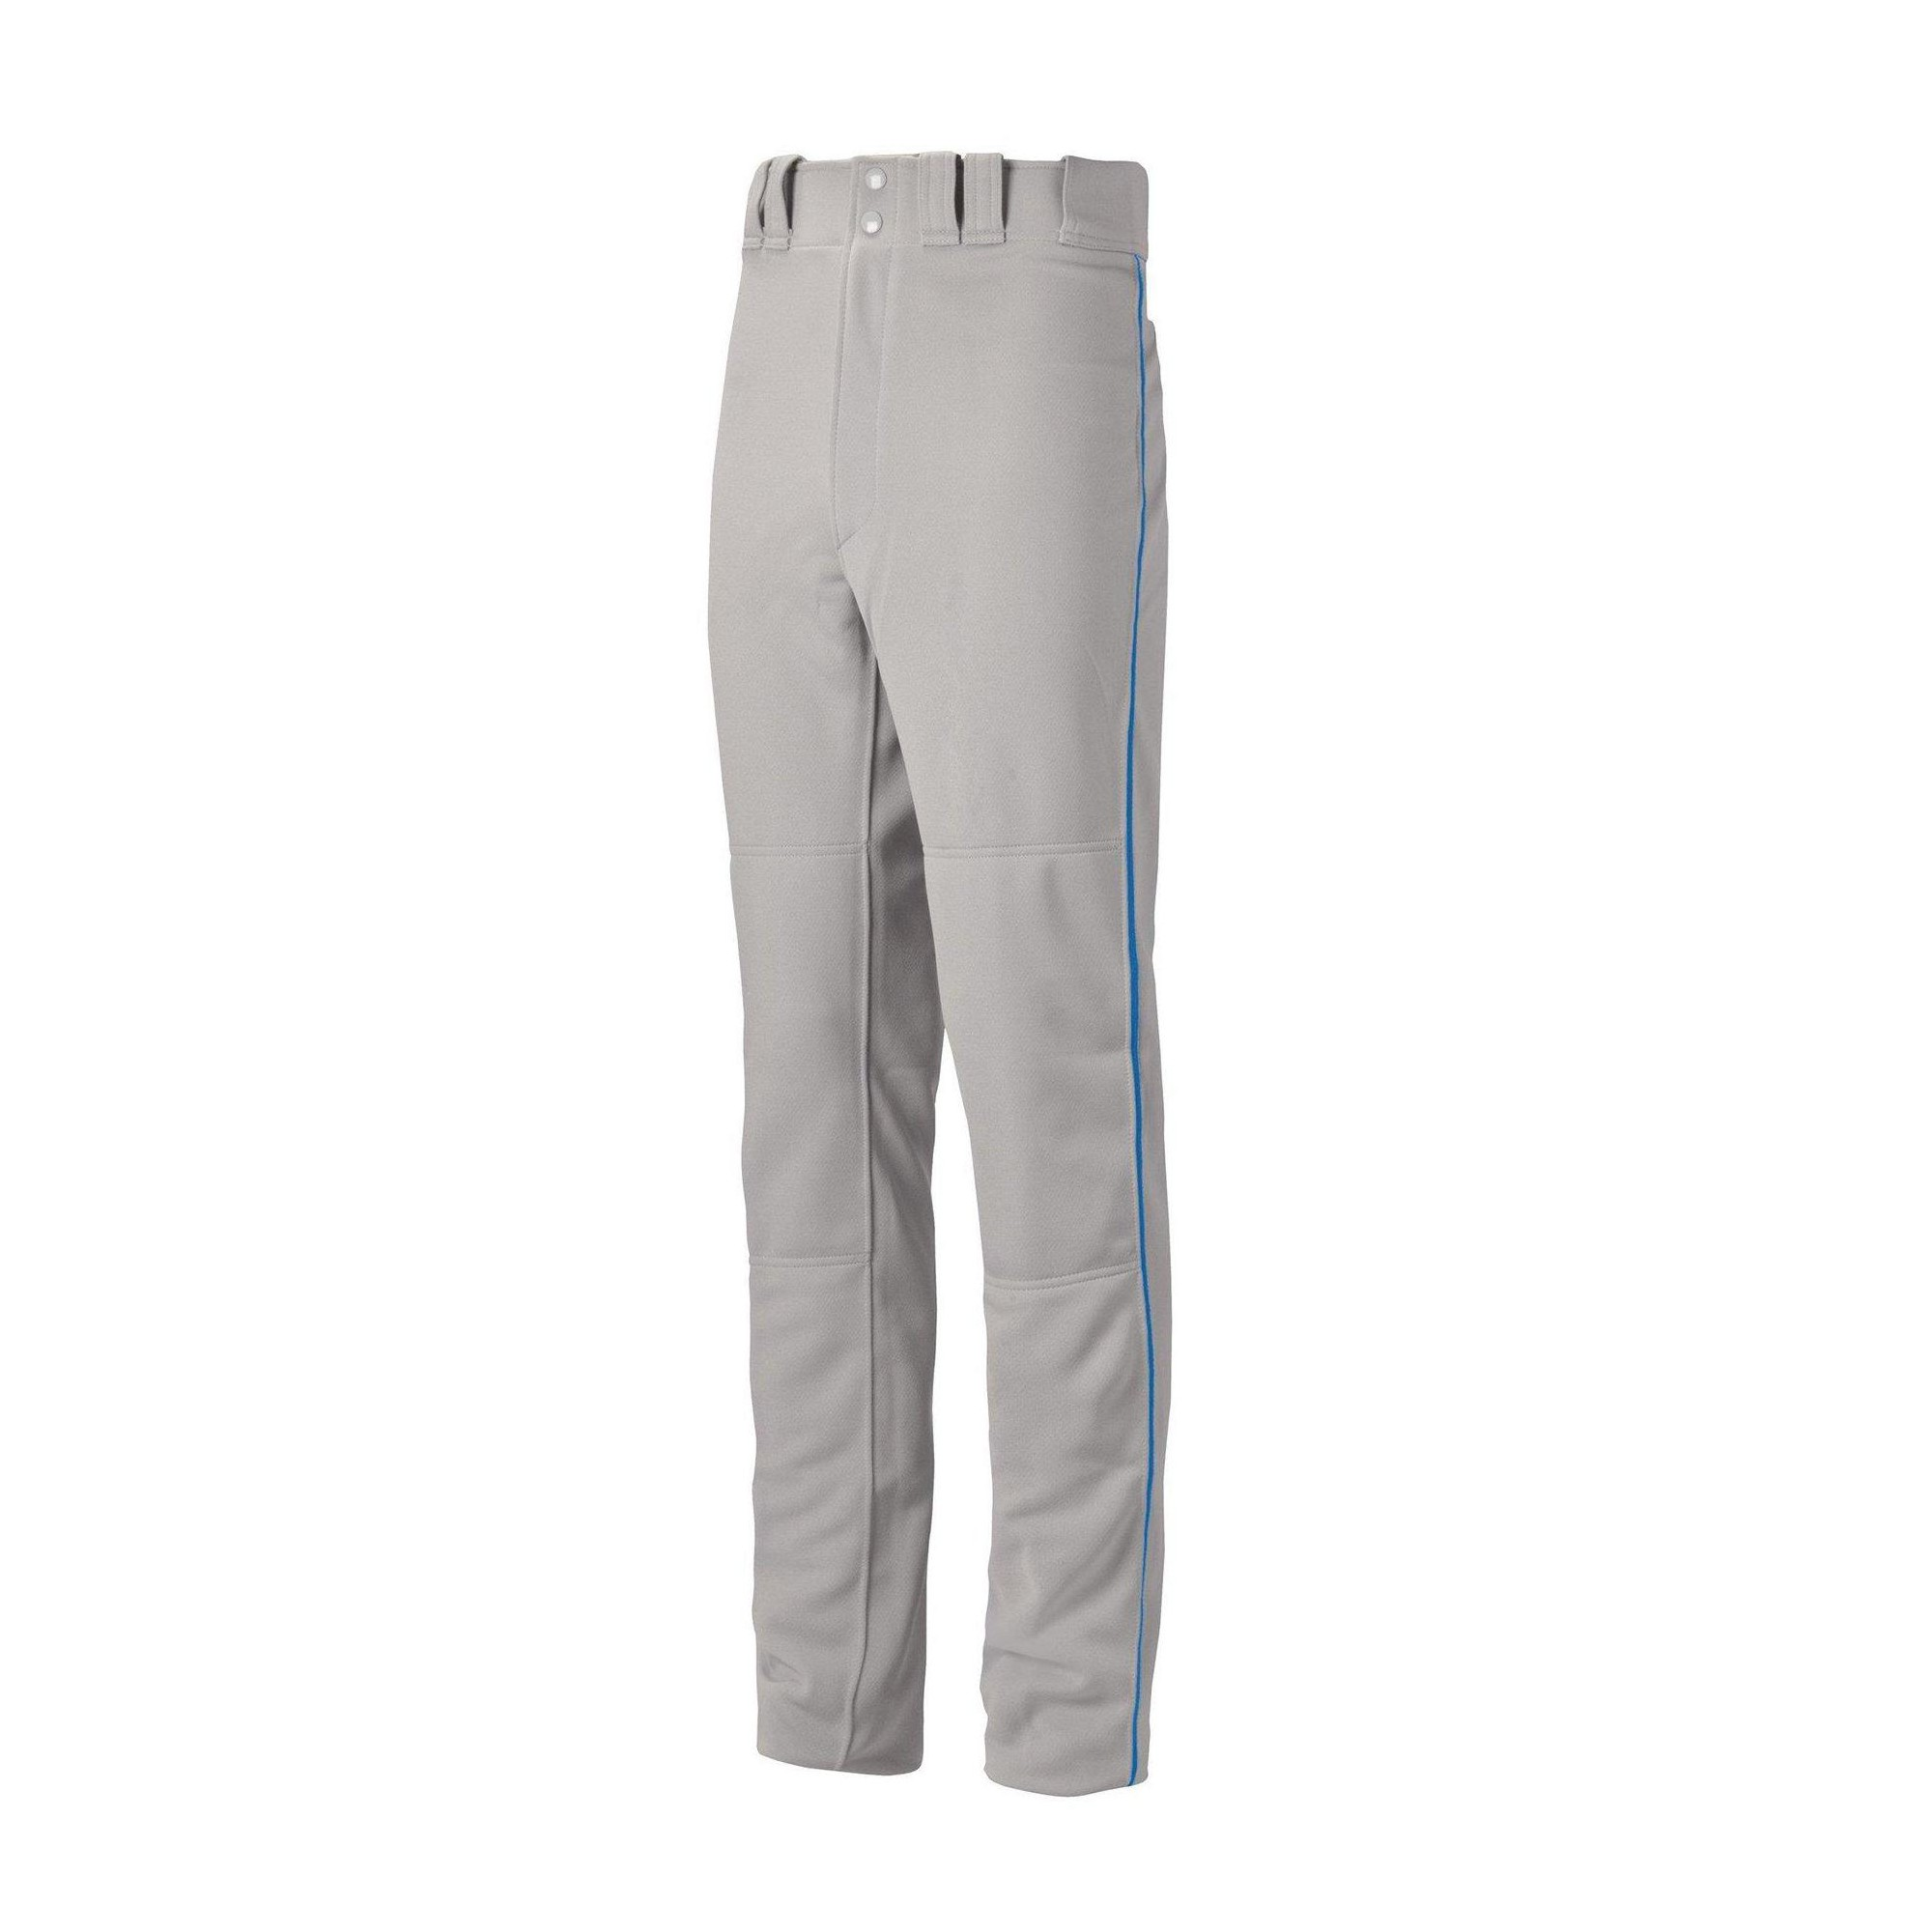 Easton Youth Baseball Pants Pro Pull Up Gray Baseball Pants Pull Ups Youth Baseball